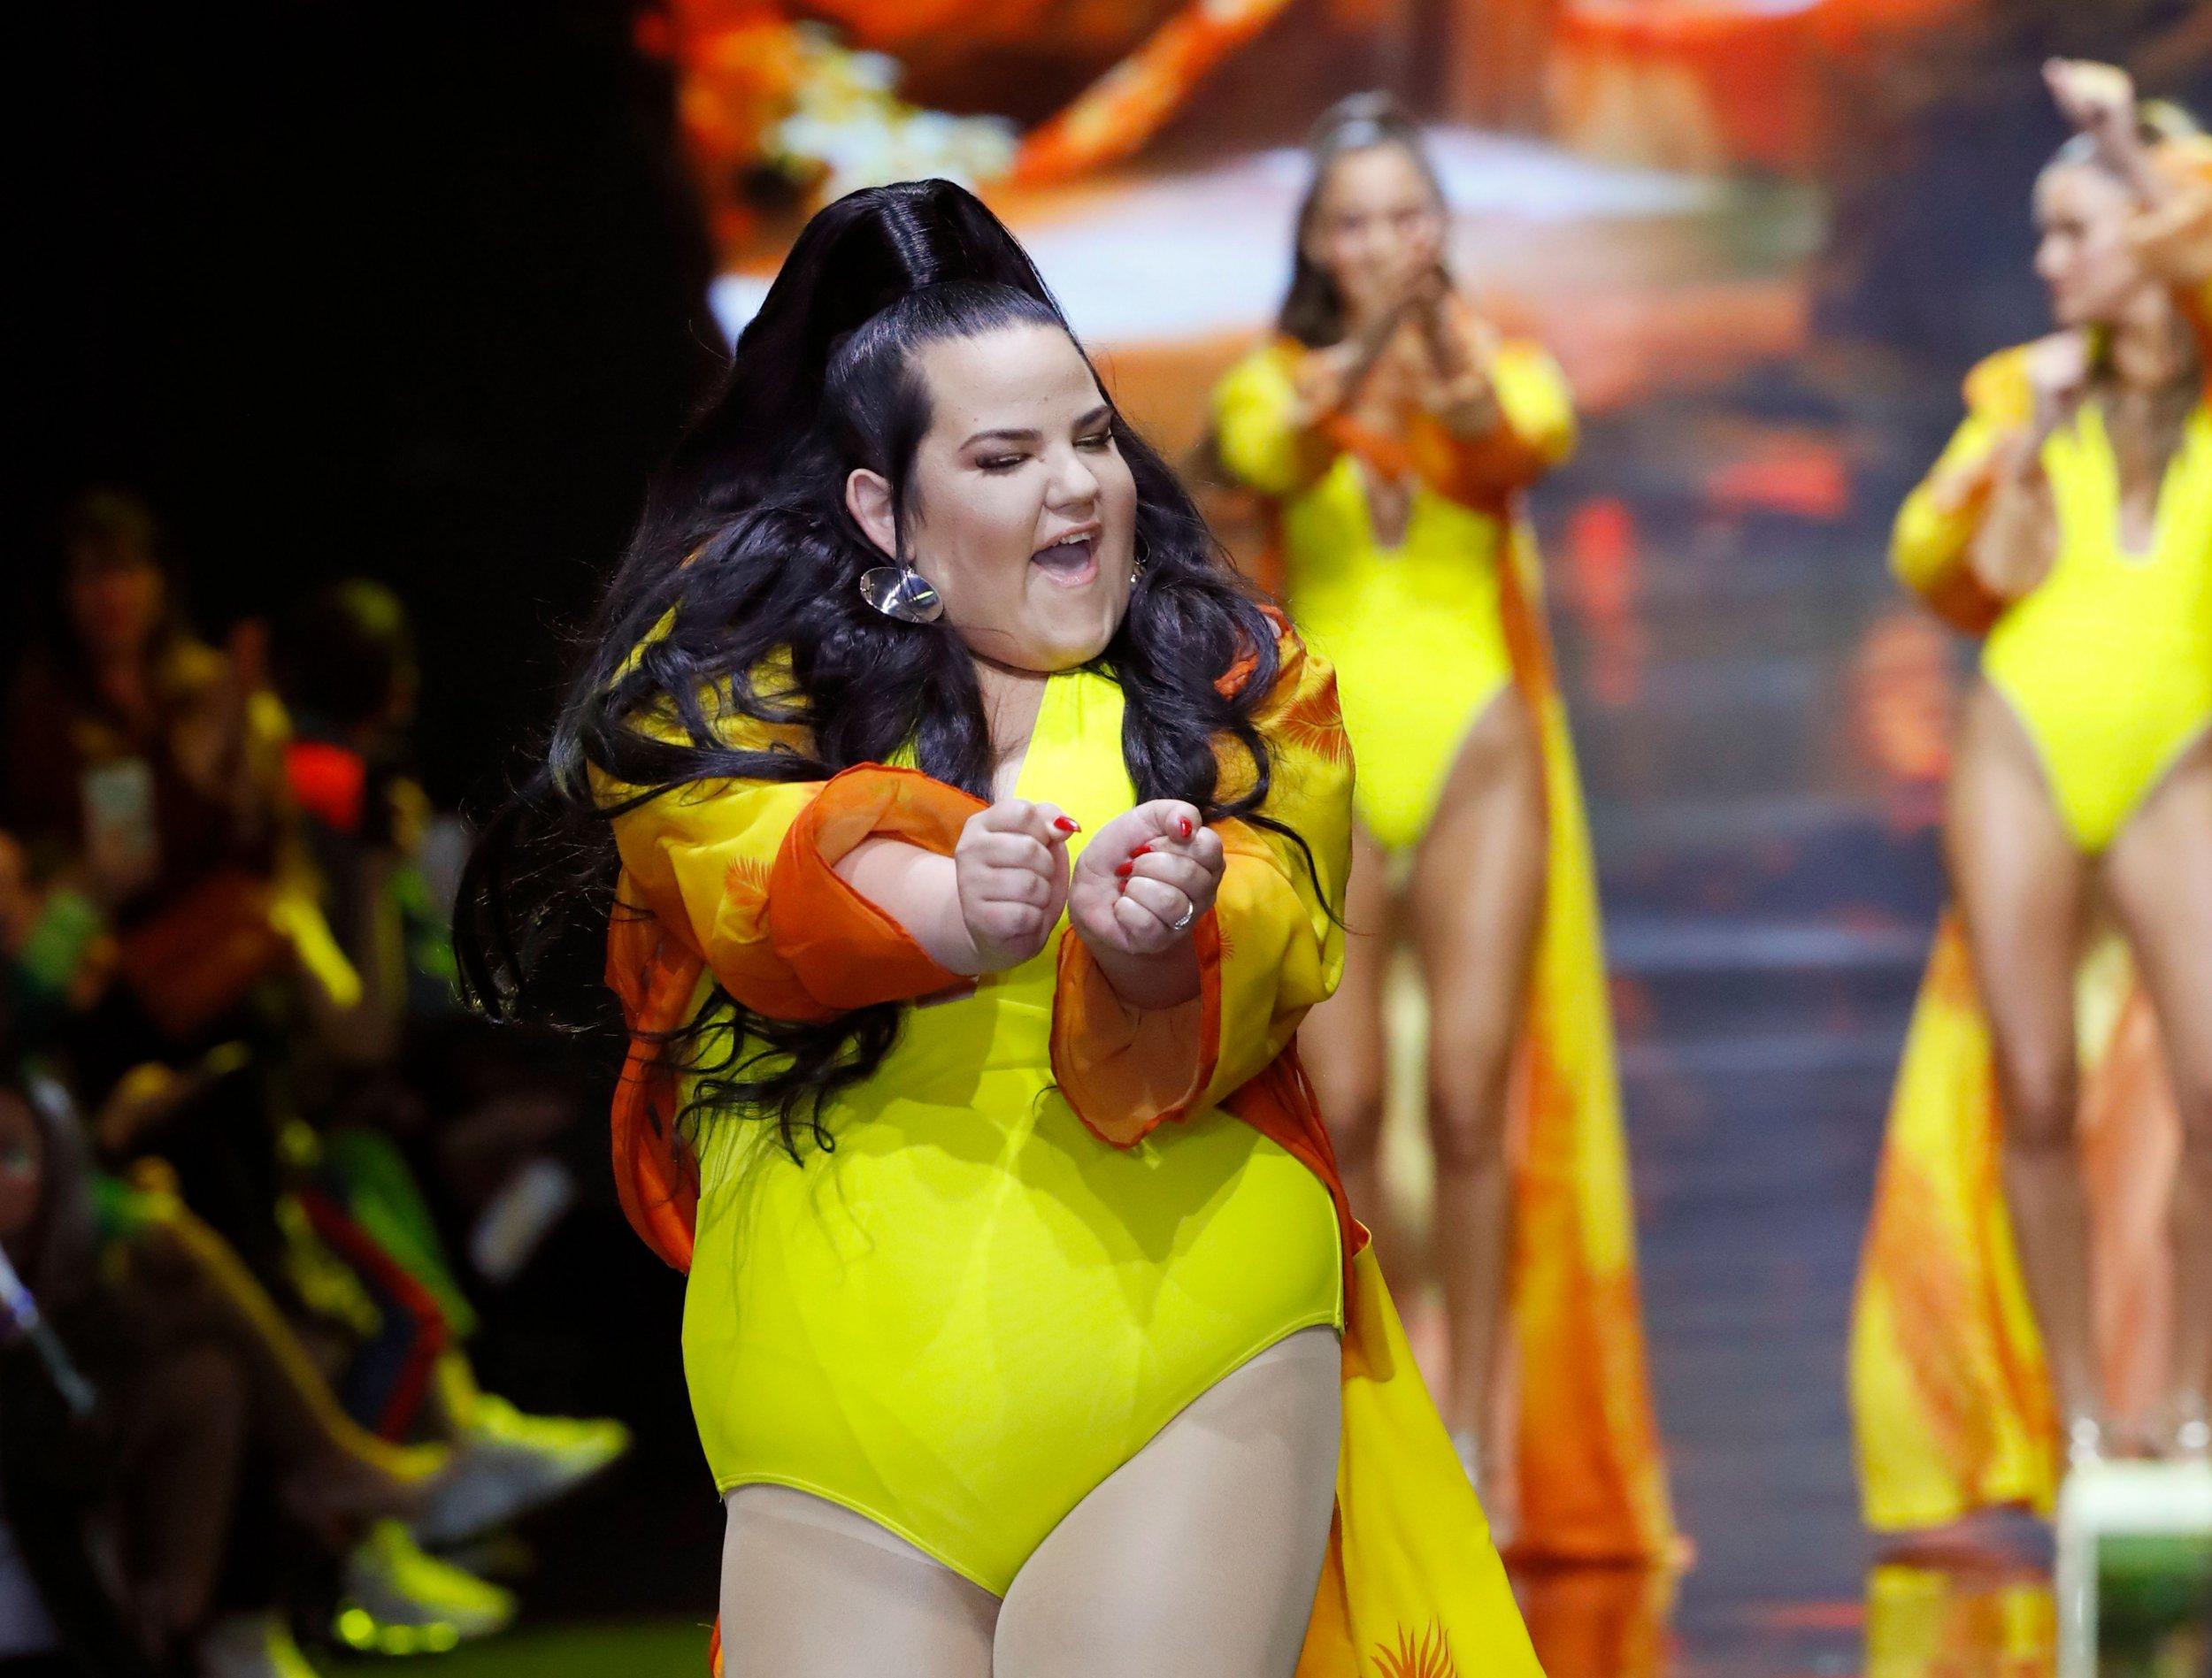 Eurovision winner Netta Barzilai looks fierce on catwalk at Tel Aviv Fashion Week